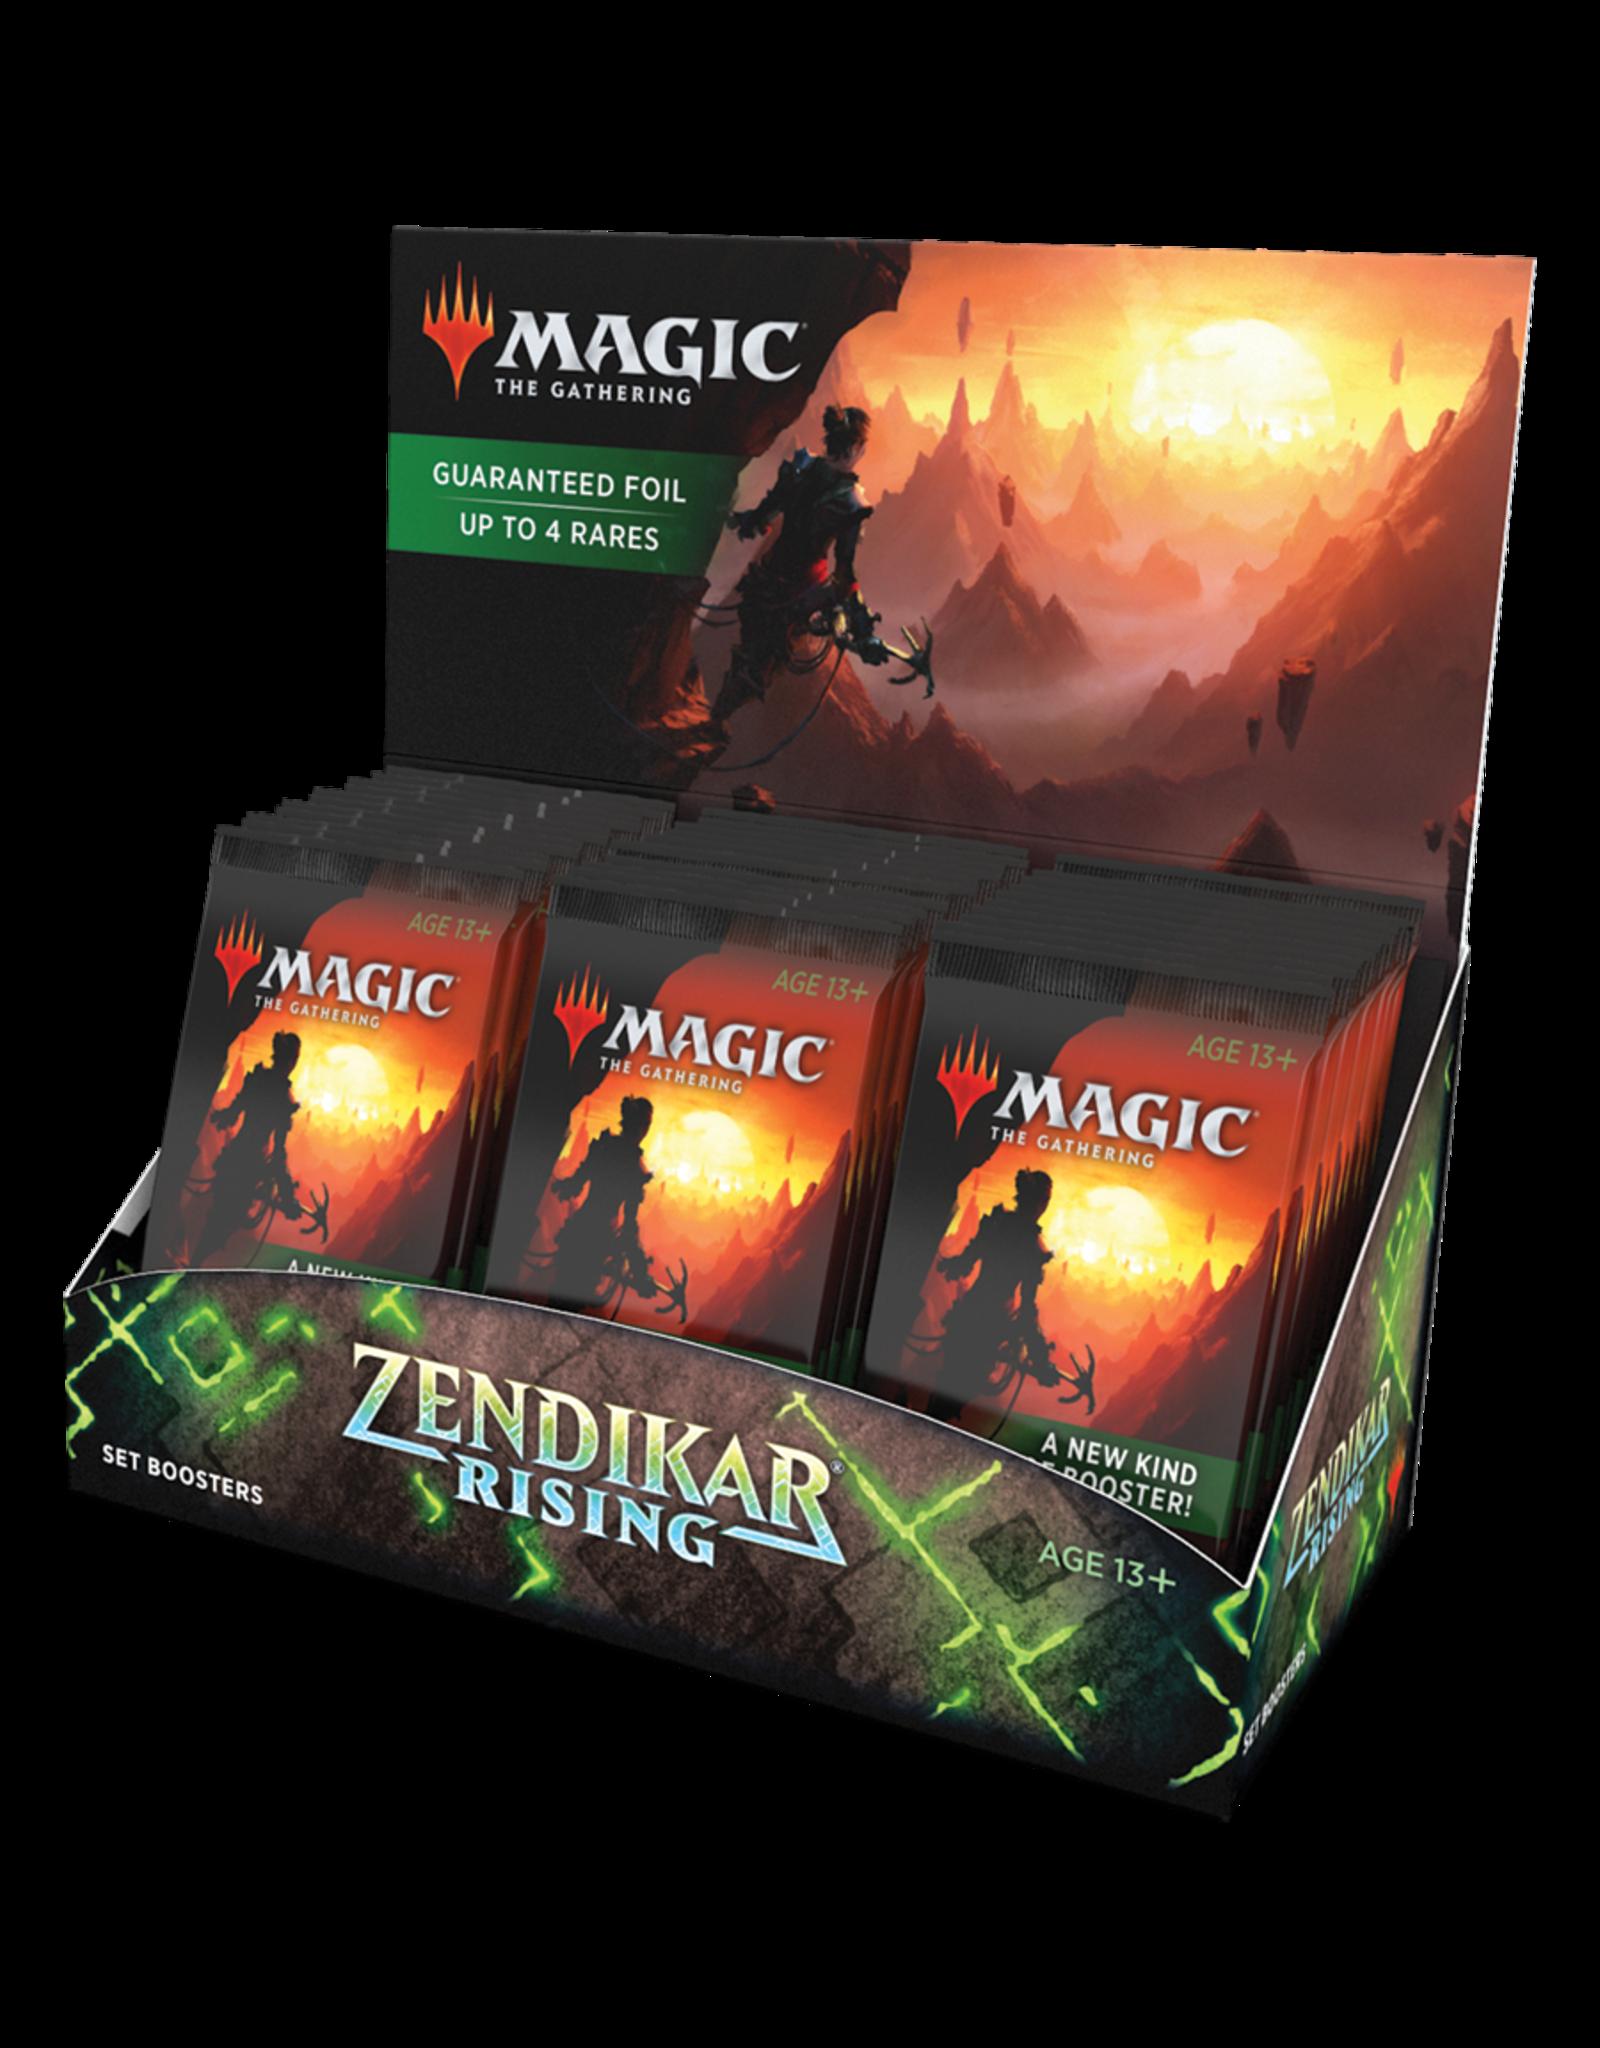 Magic: The Gathering Magic: The Gathering - Zendikar Rising Set Booster Box